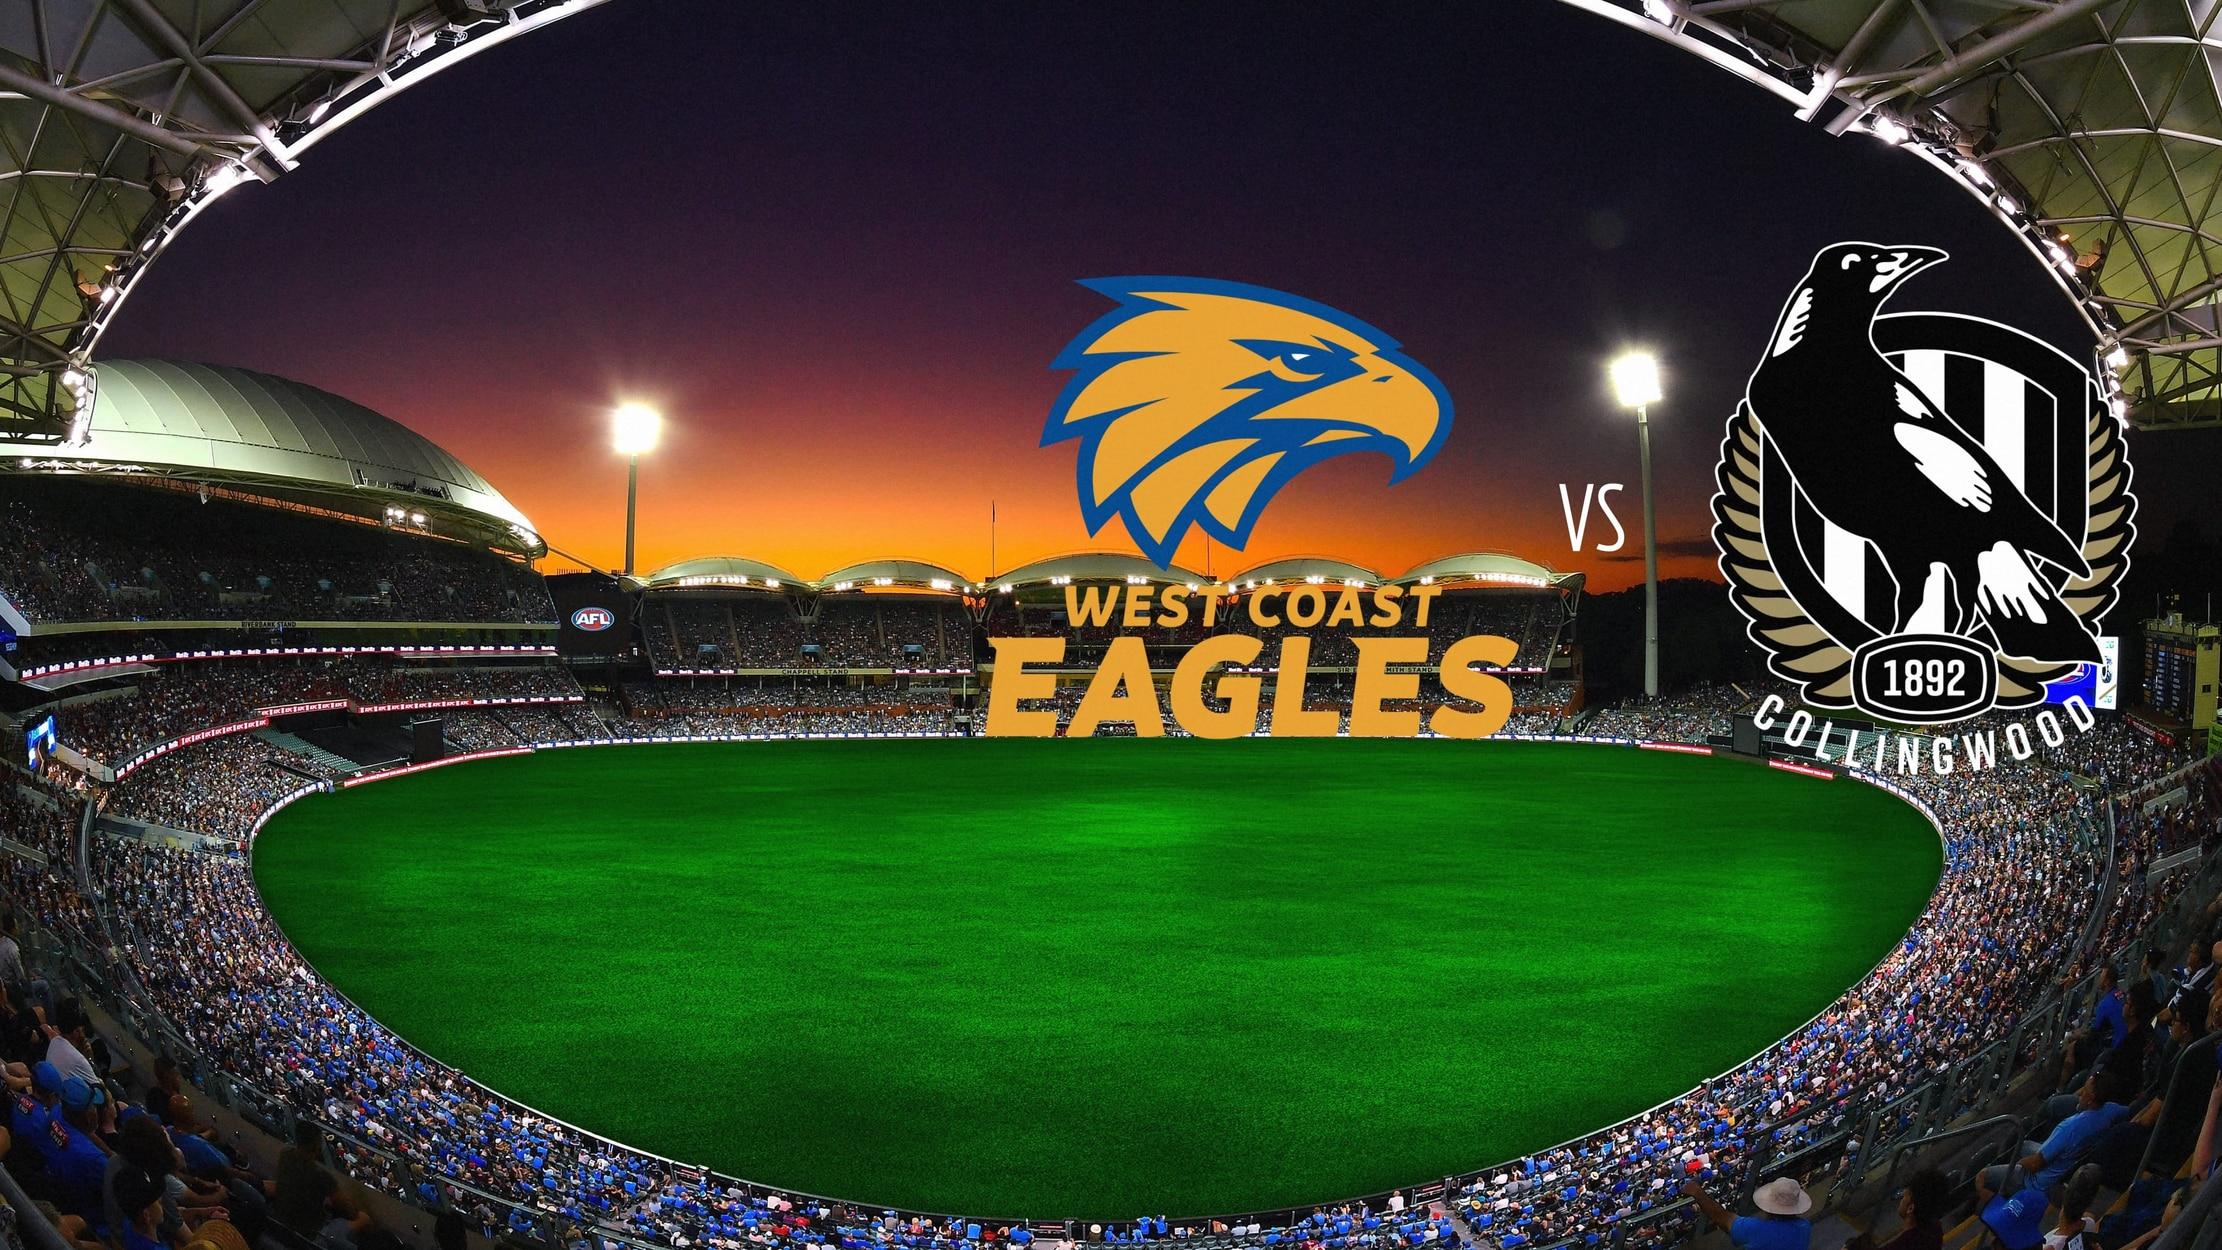 AFL Premiership Football - Collingwood Magpies at West Coast Eagles